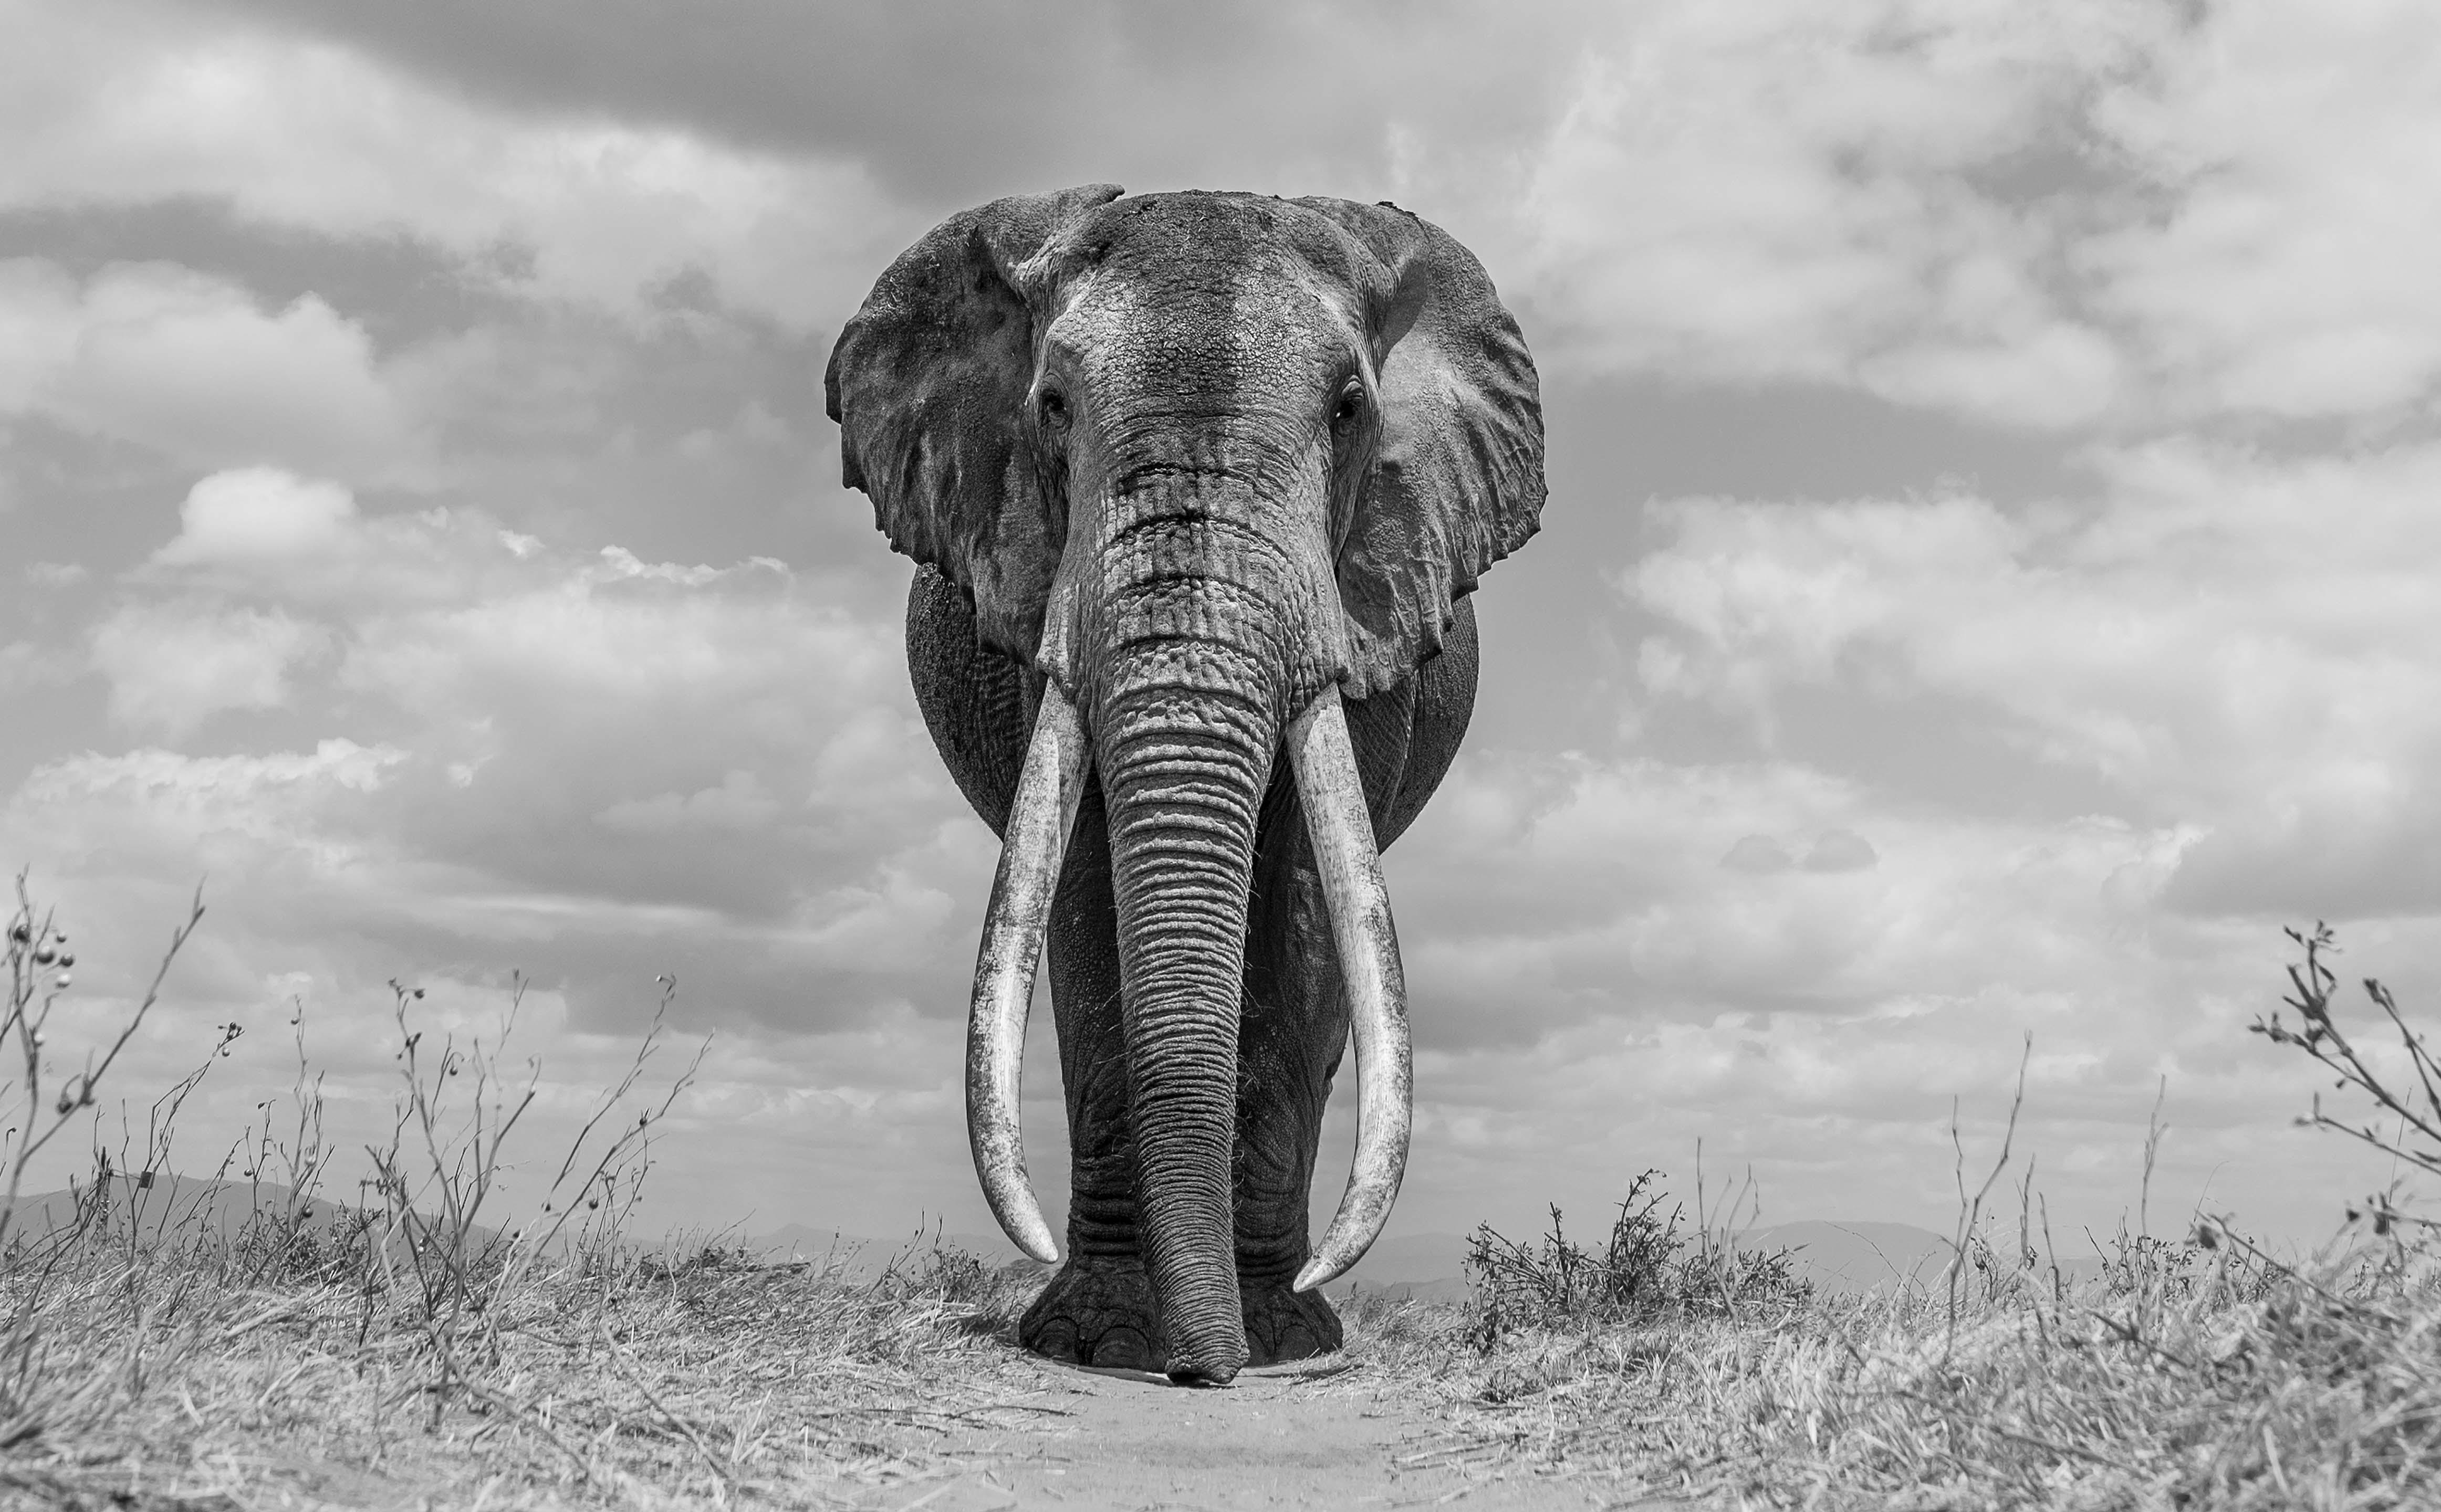 The Big Friendly Giant, Tsavo, Kenya.